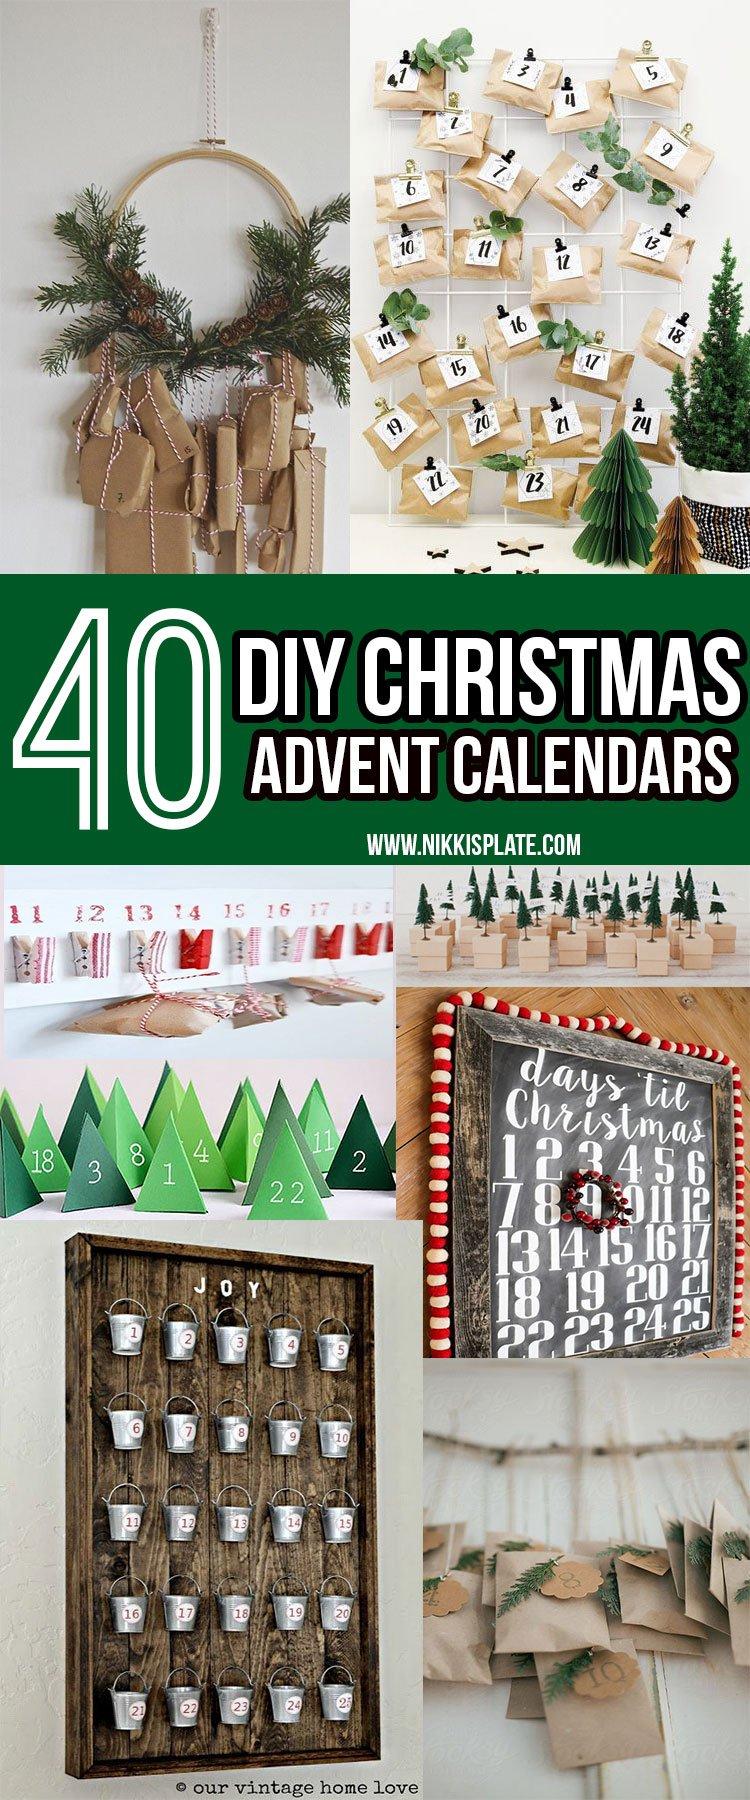 40 DIY Christmas Advent Calendars || Christmas decor, crafts and fun! || Nikki's Plate